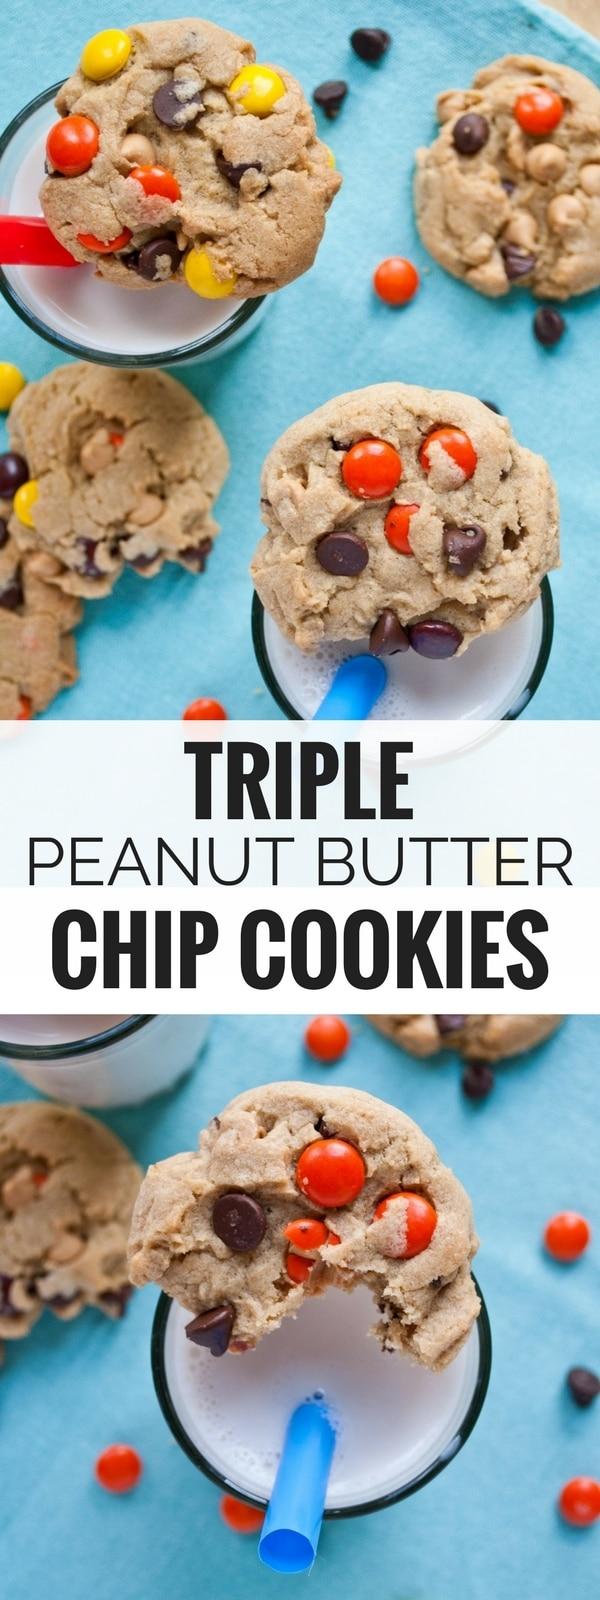 Triple Peanut Butter Chocolate Chip Cookies | Neighborfood